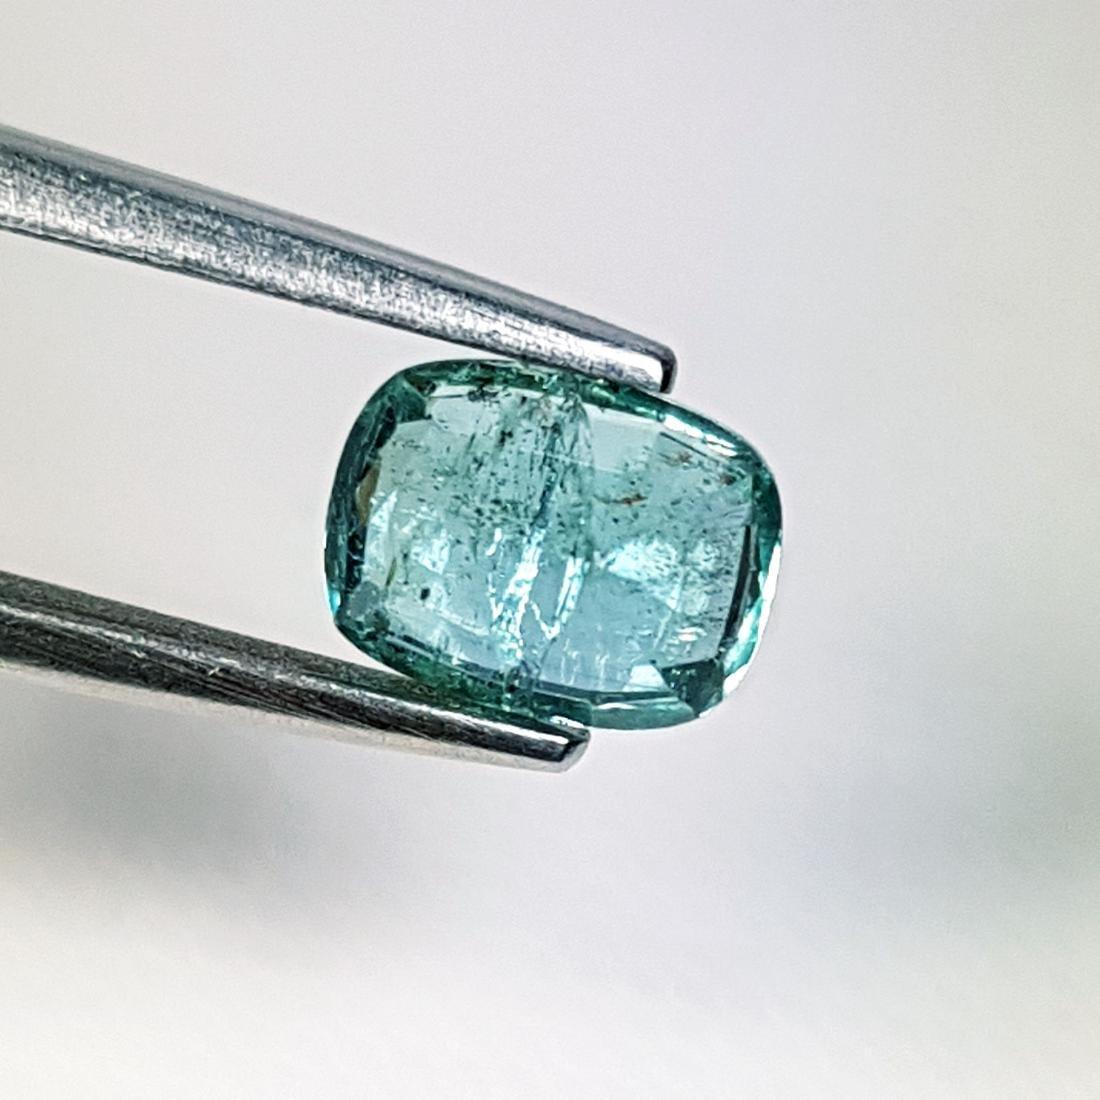 Emerald - 1.47 - 4